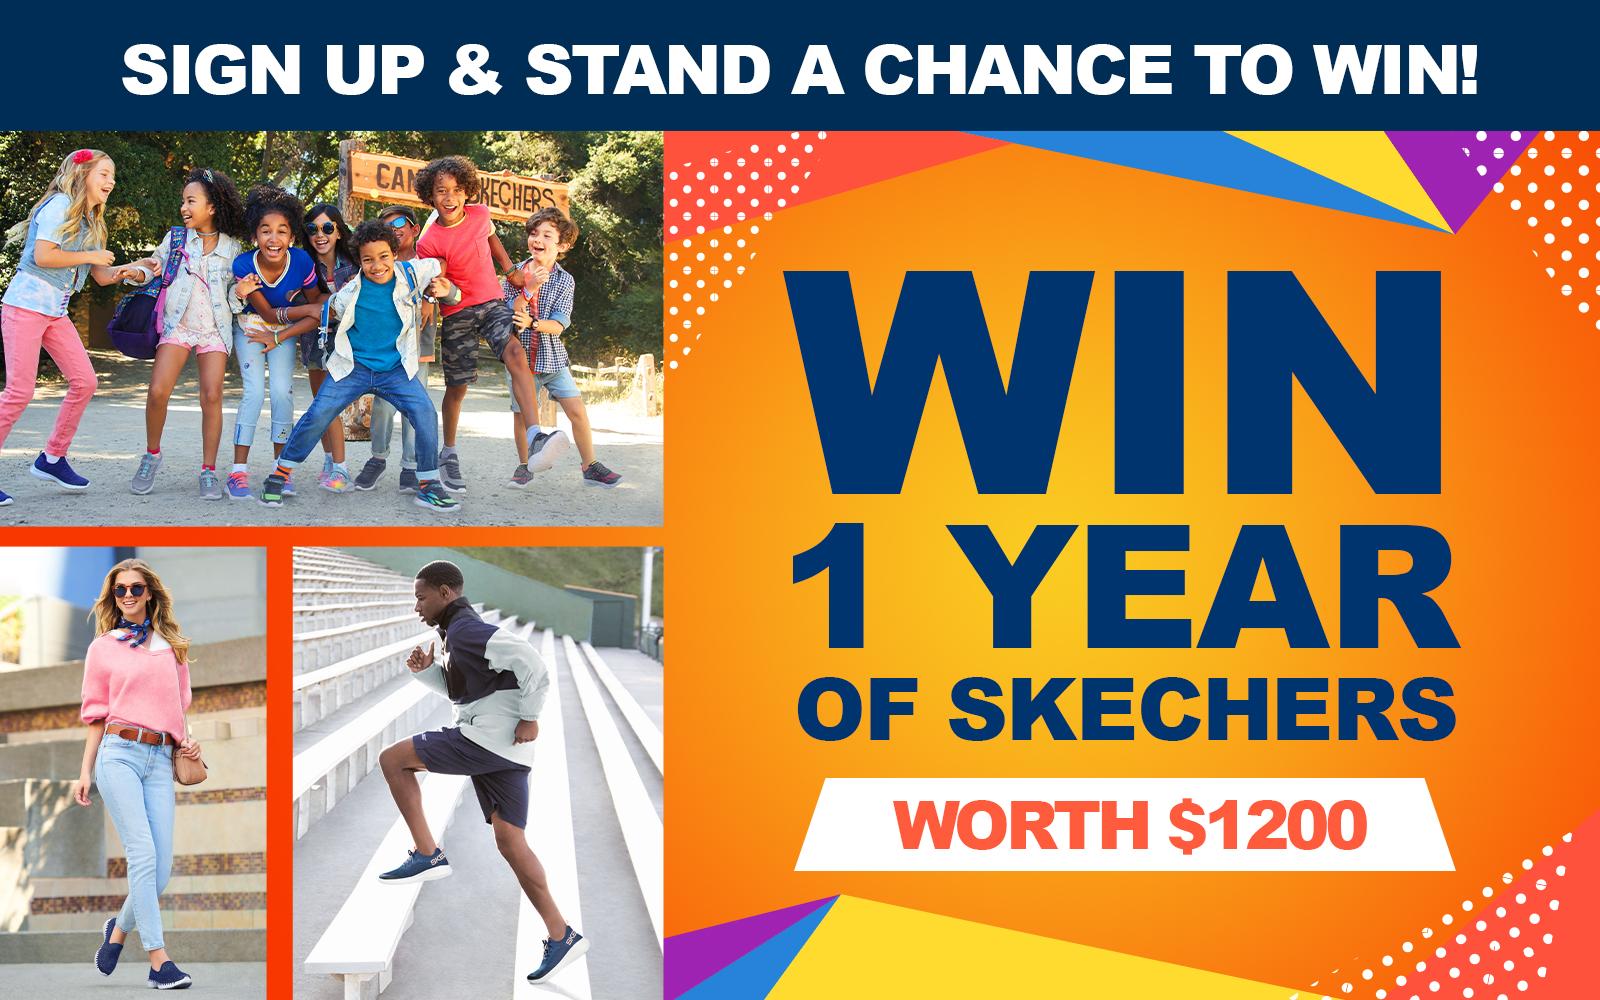 Skechers Friendship Walk 2020 Grand Prize